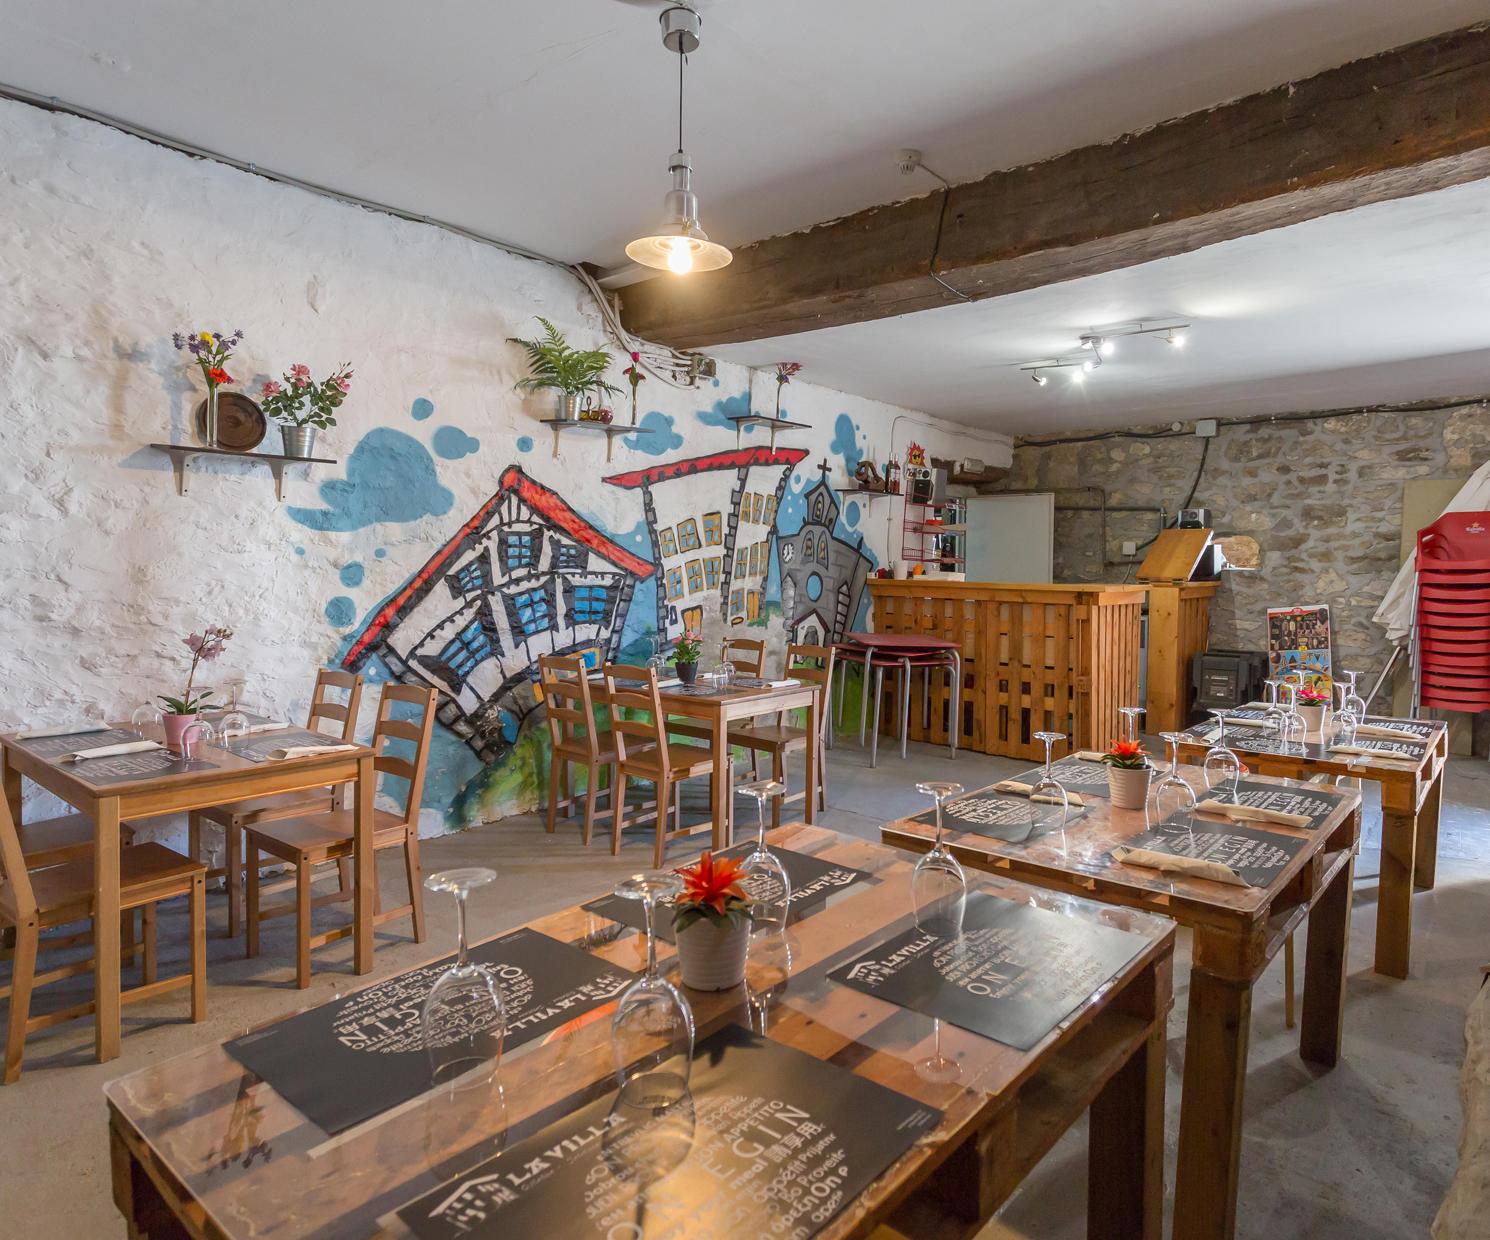 Cocina tradicional en Navarra